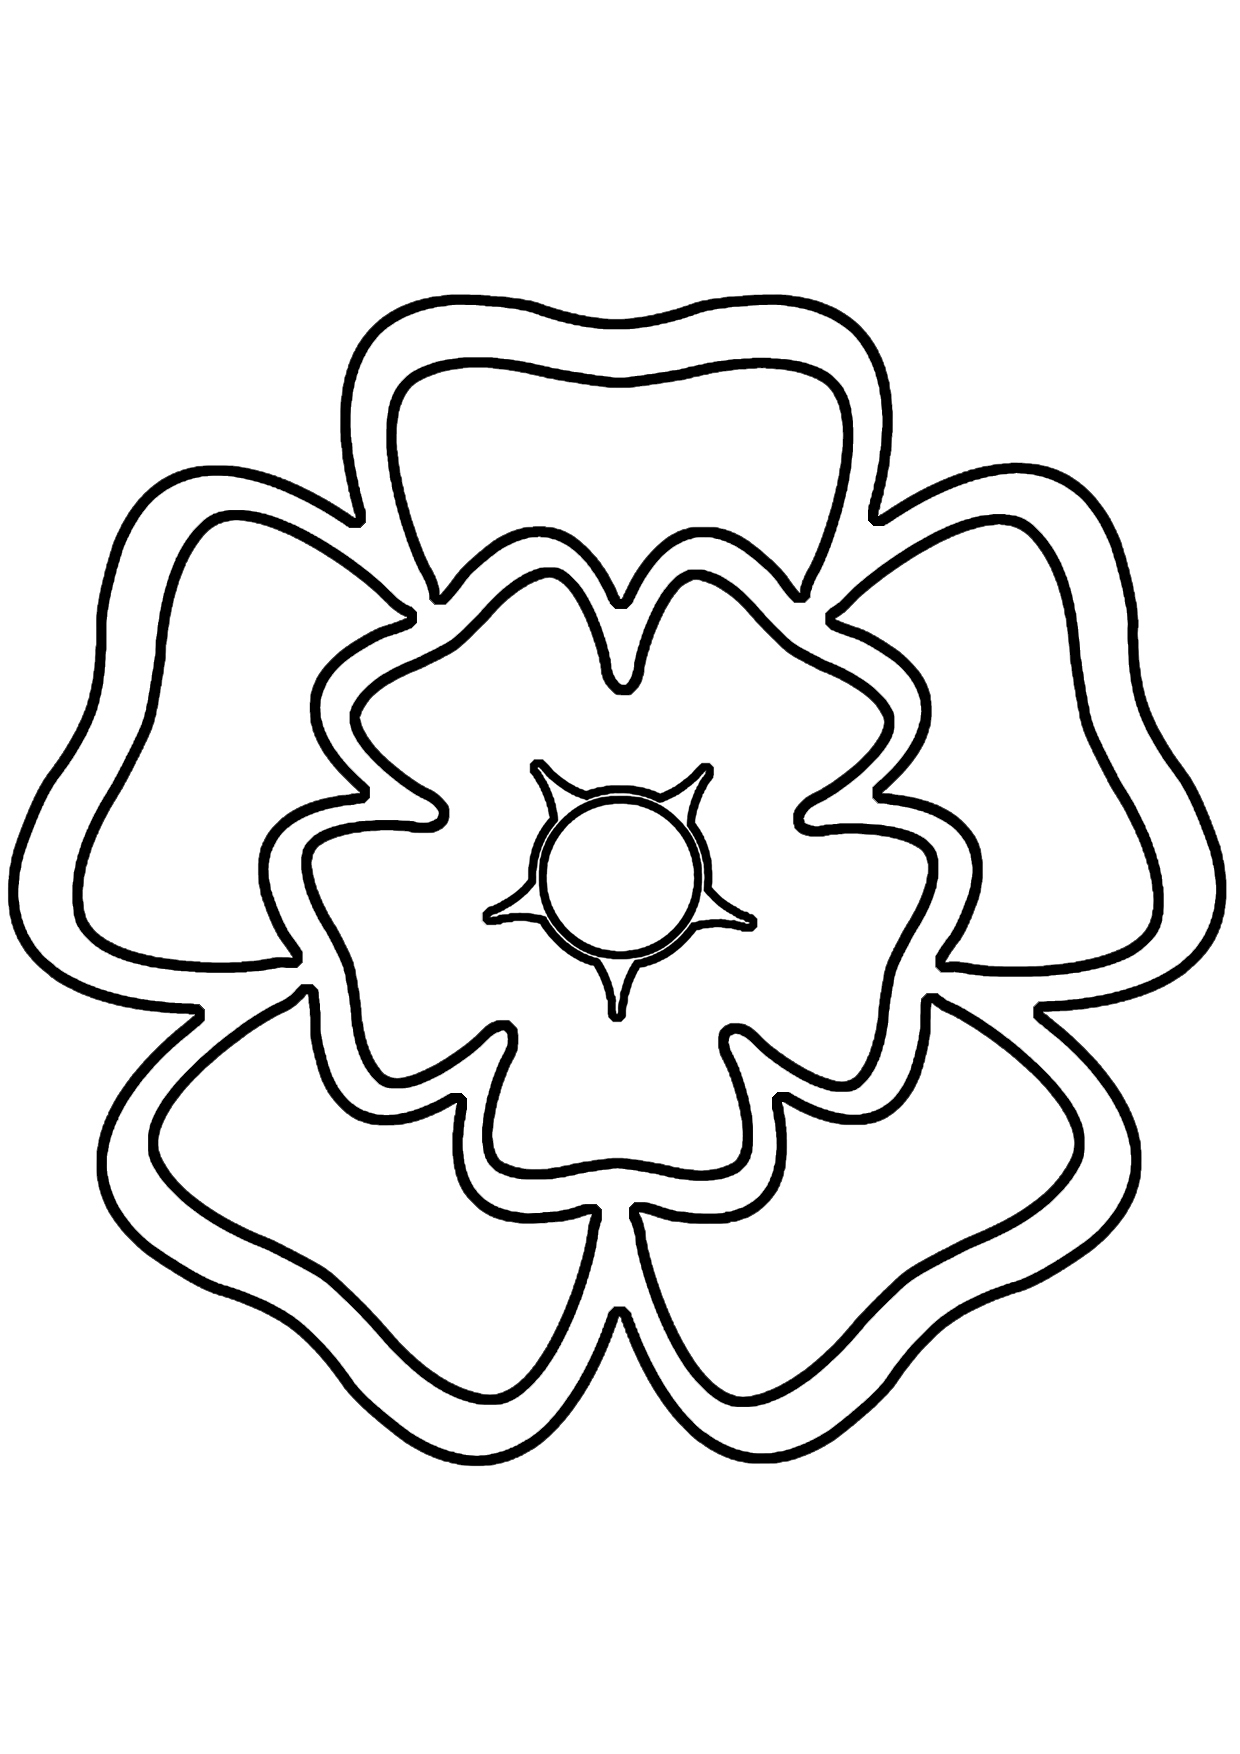 Flower Outlines Printable Flower Stencil Outline...